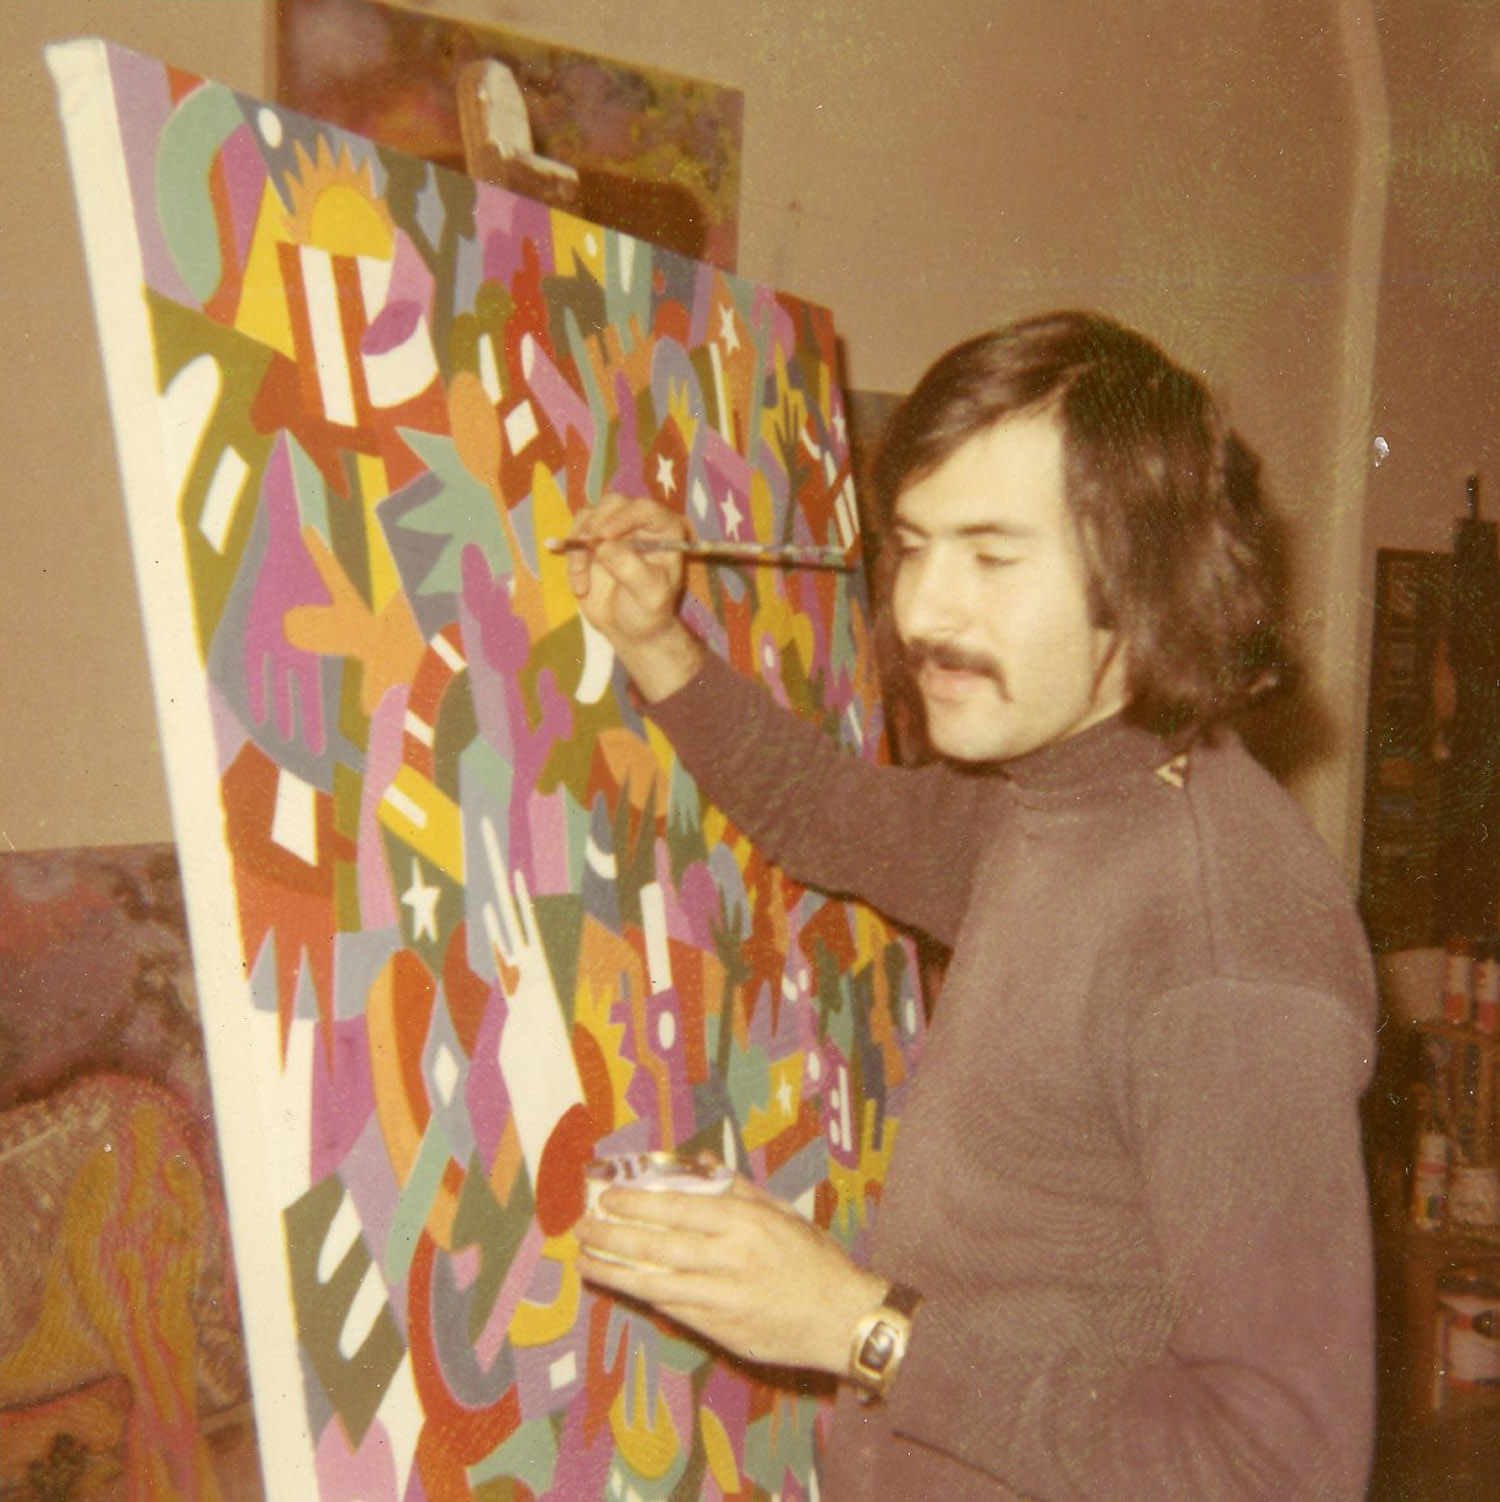 Marc painting, c. 1971.